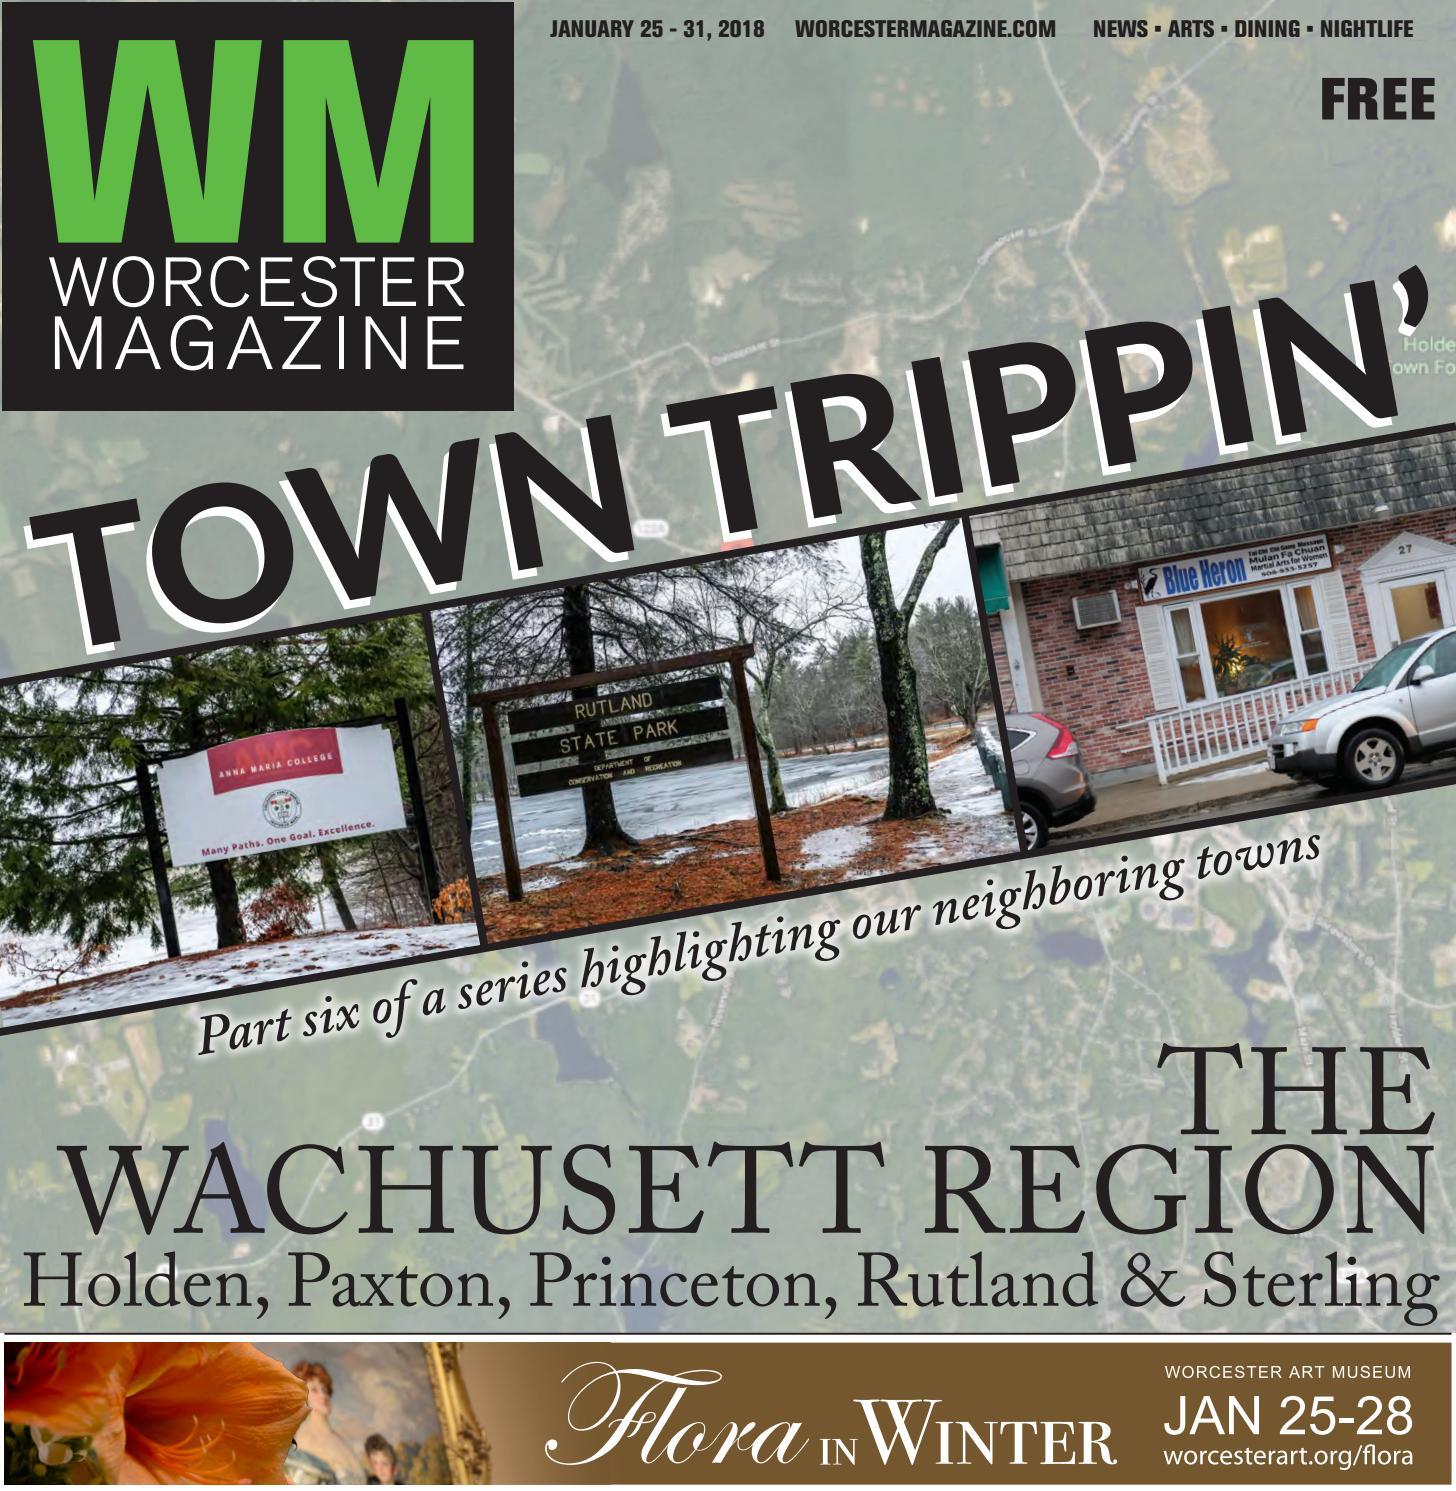 929b3204e6f3 Worcester Magazine January 25 - 31